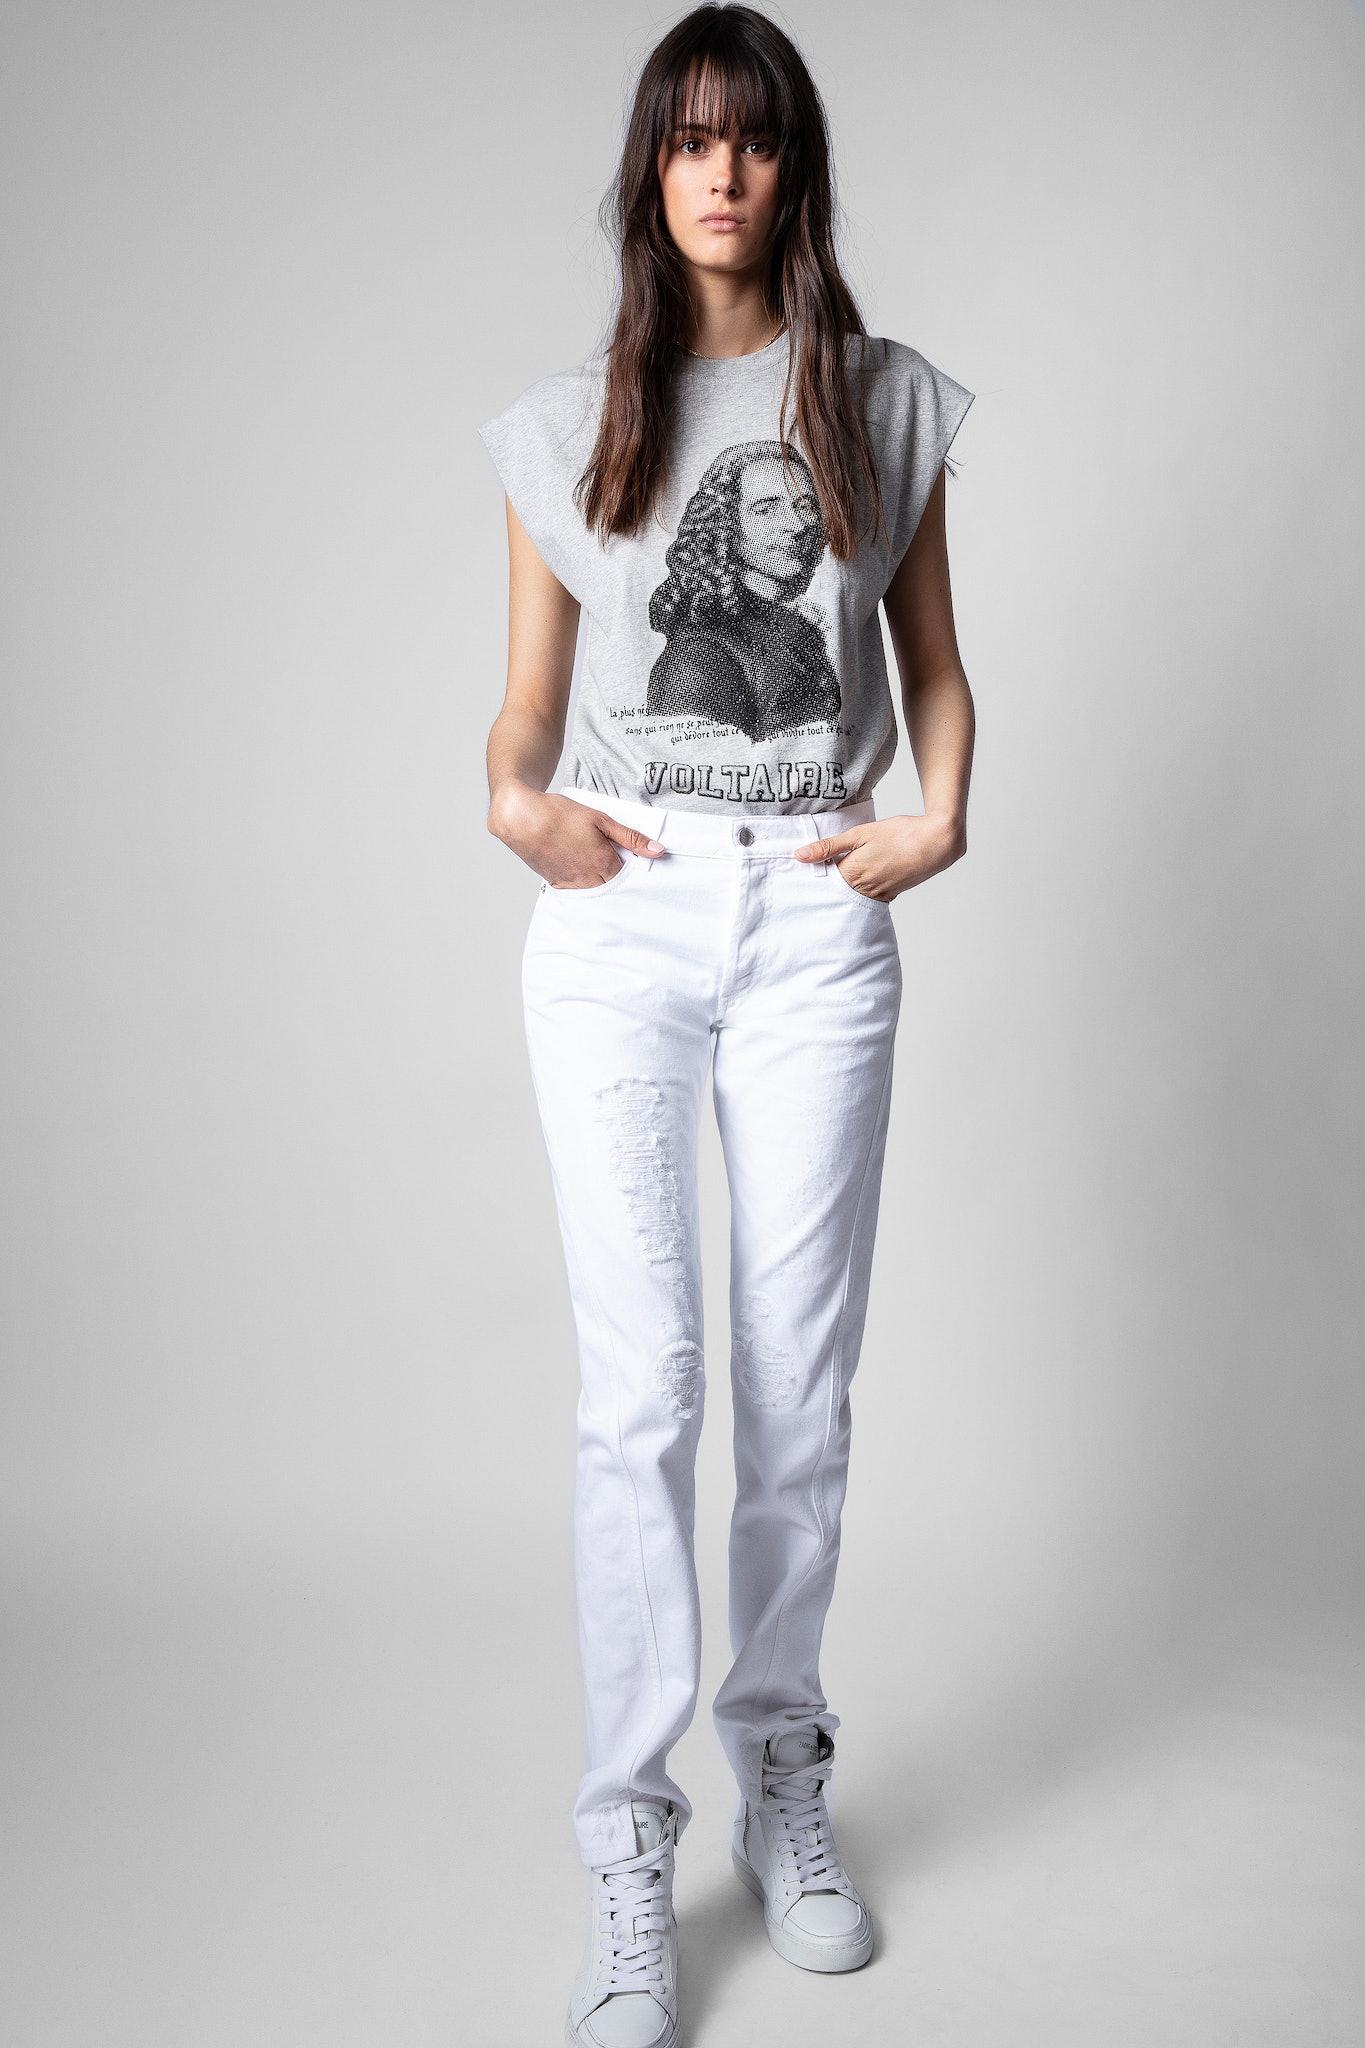 Cecilia Voltaire Strass T-Shirt